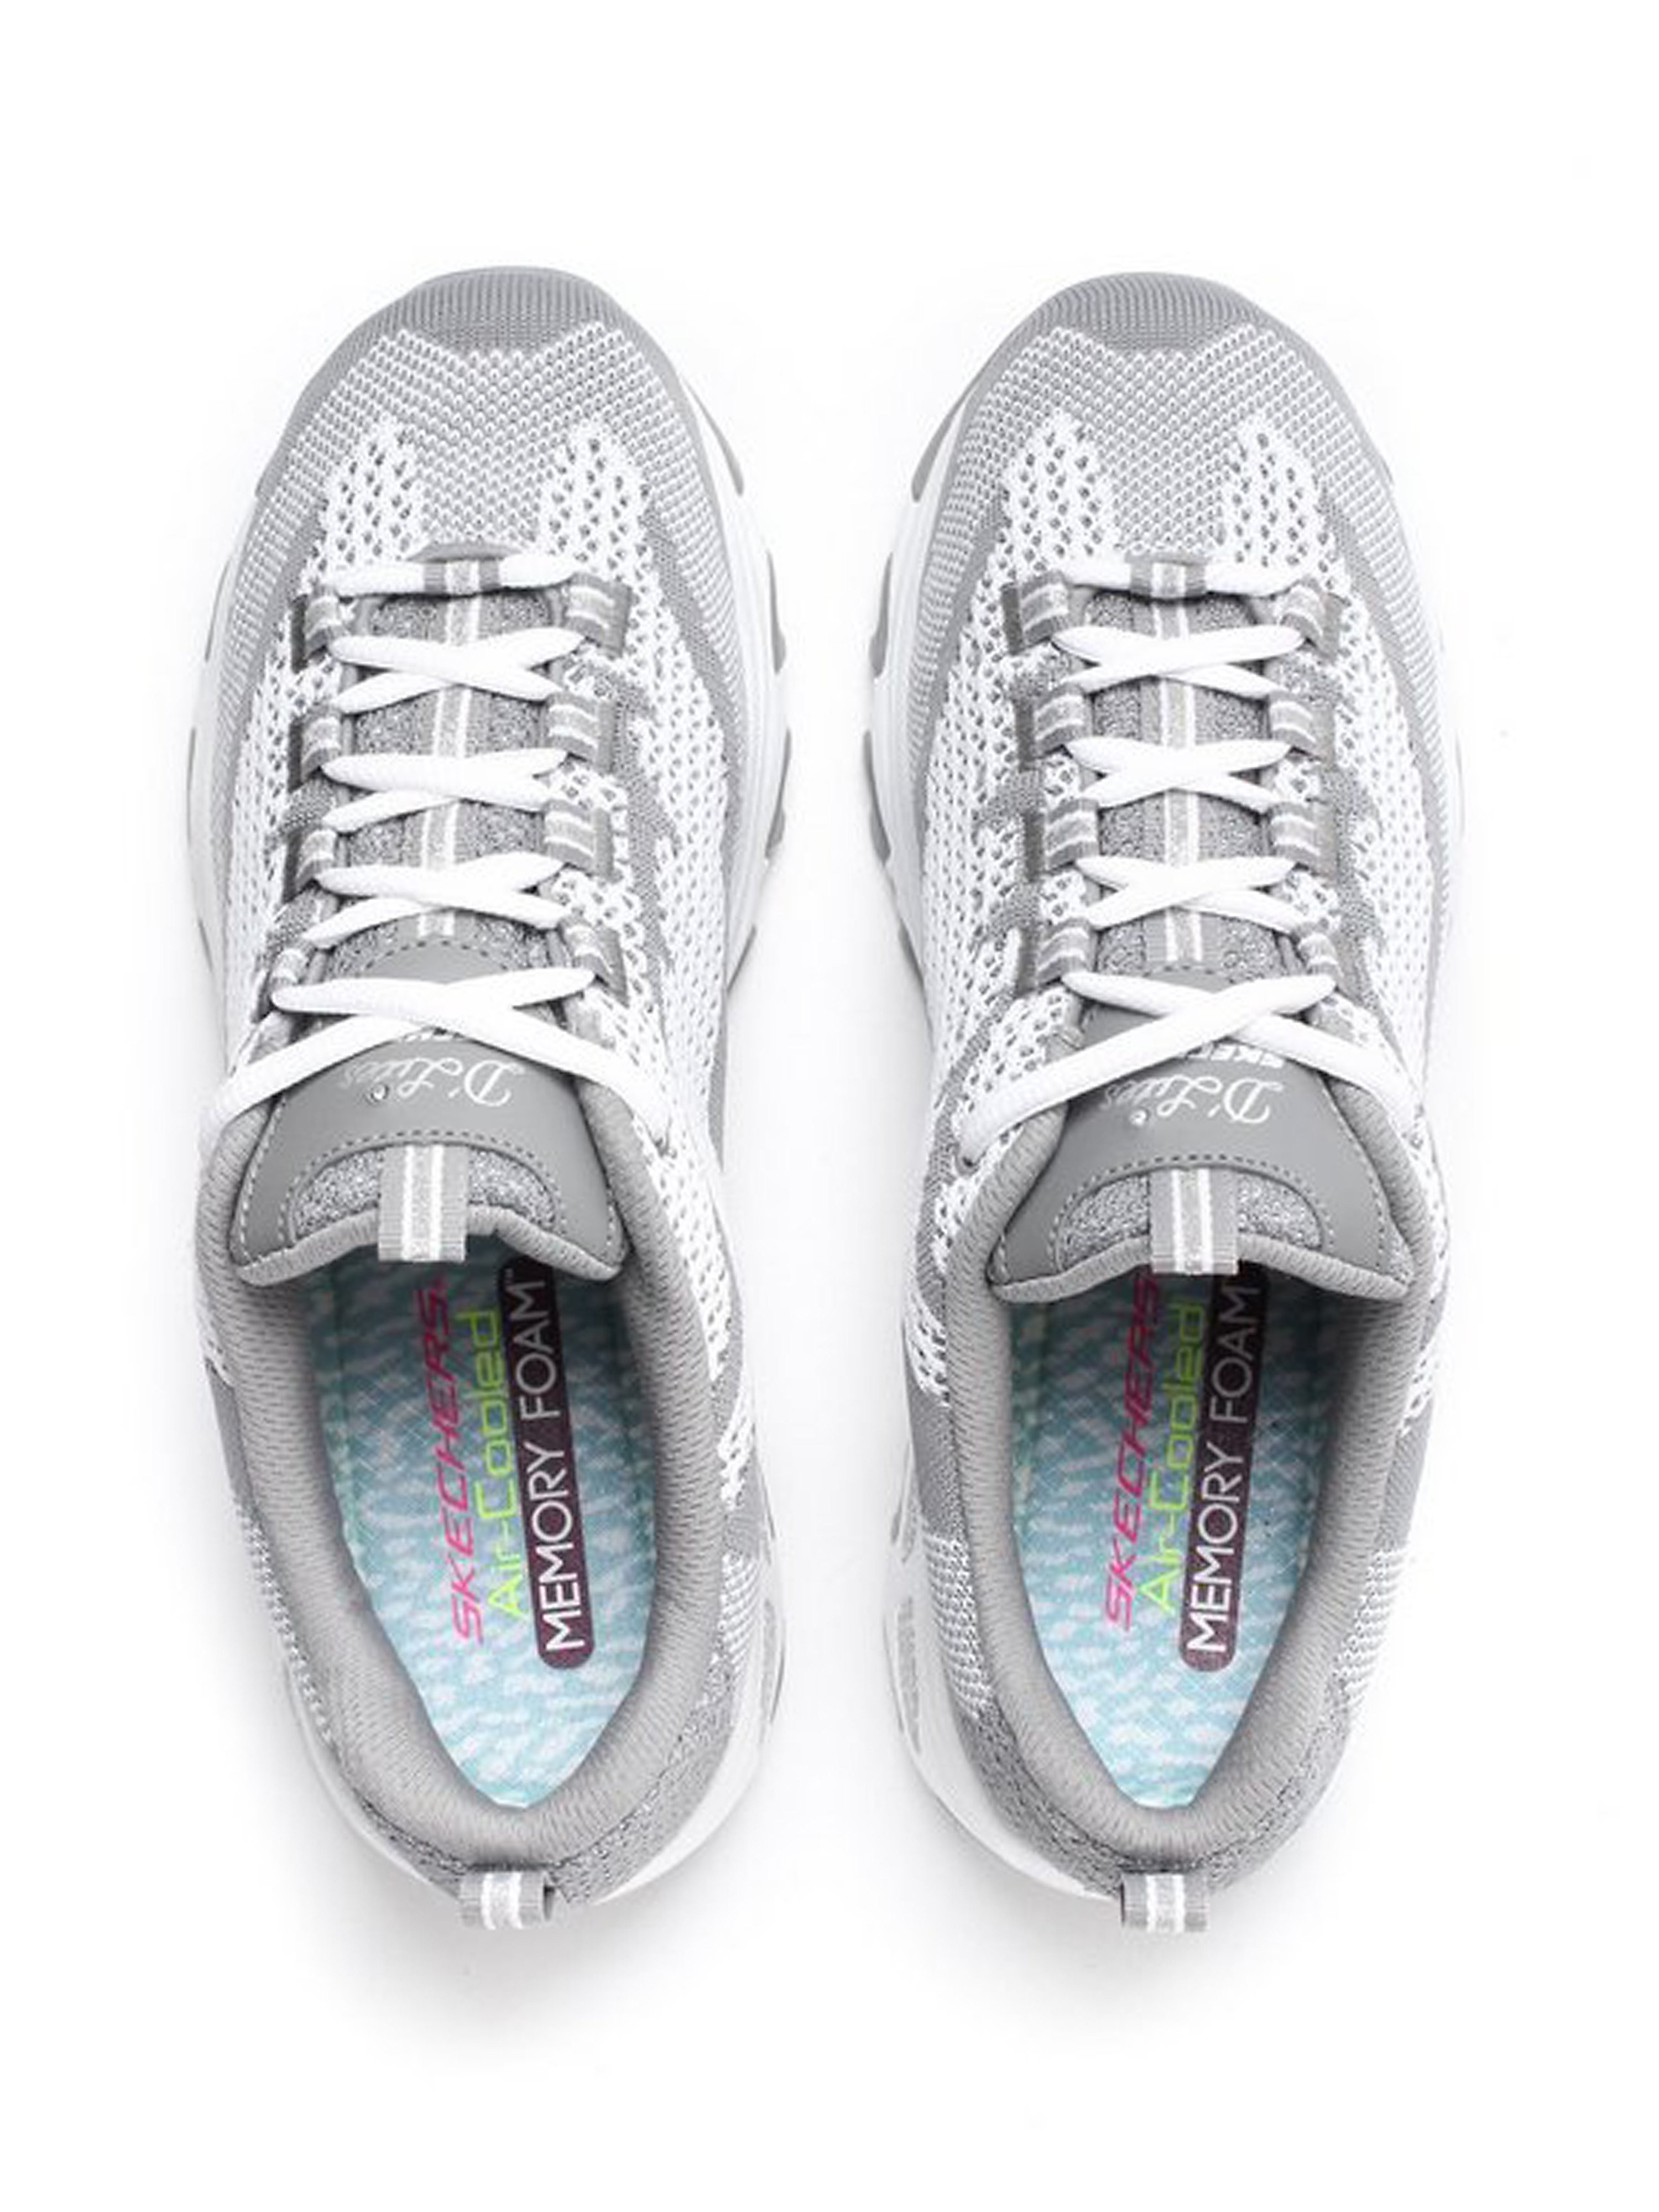 Skechers Skechers Women's D'Lites Reinvention Trainers - Grey & White